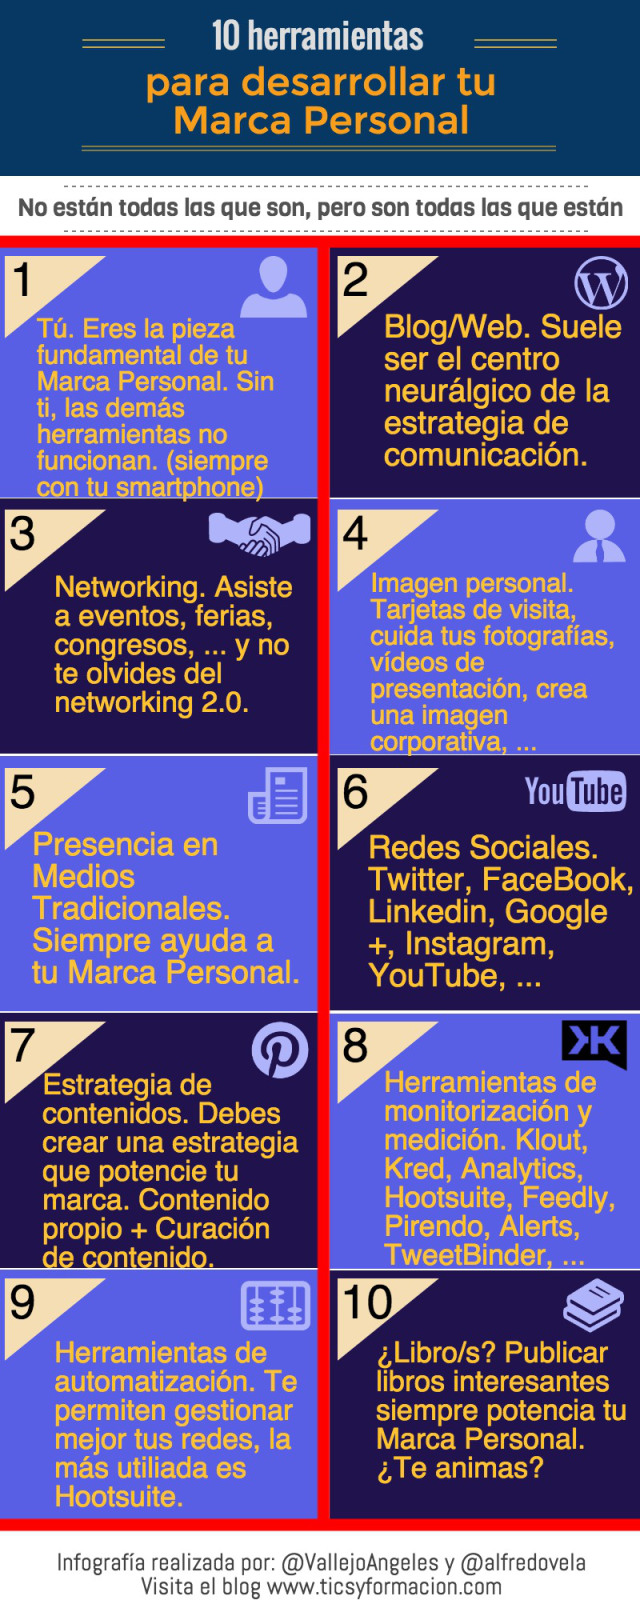 10-herramientas-marca-personal-infografia